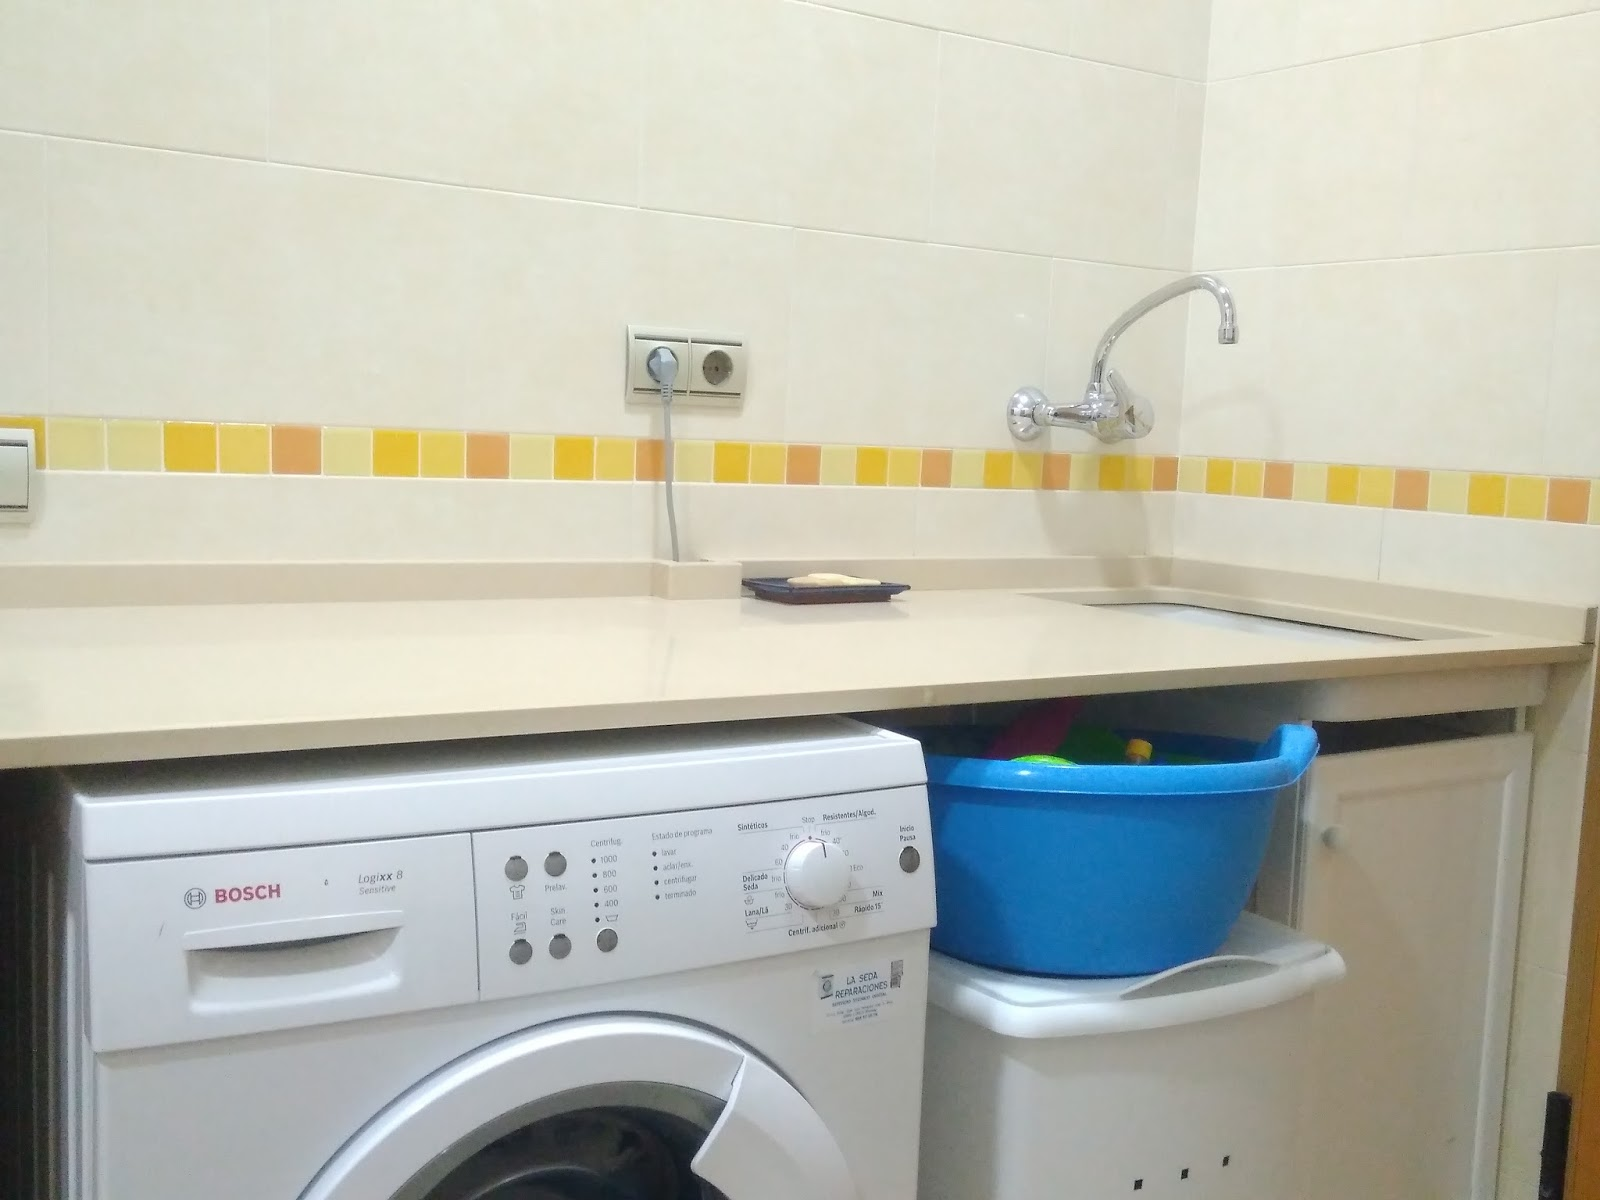 Trucos limpieza higiene hogar - Trucos limpieza hogar ...